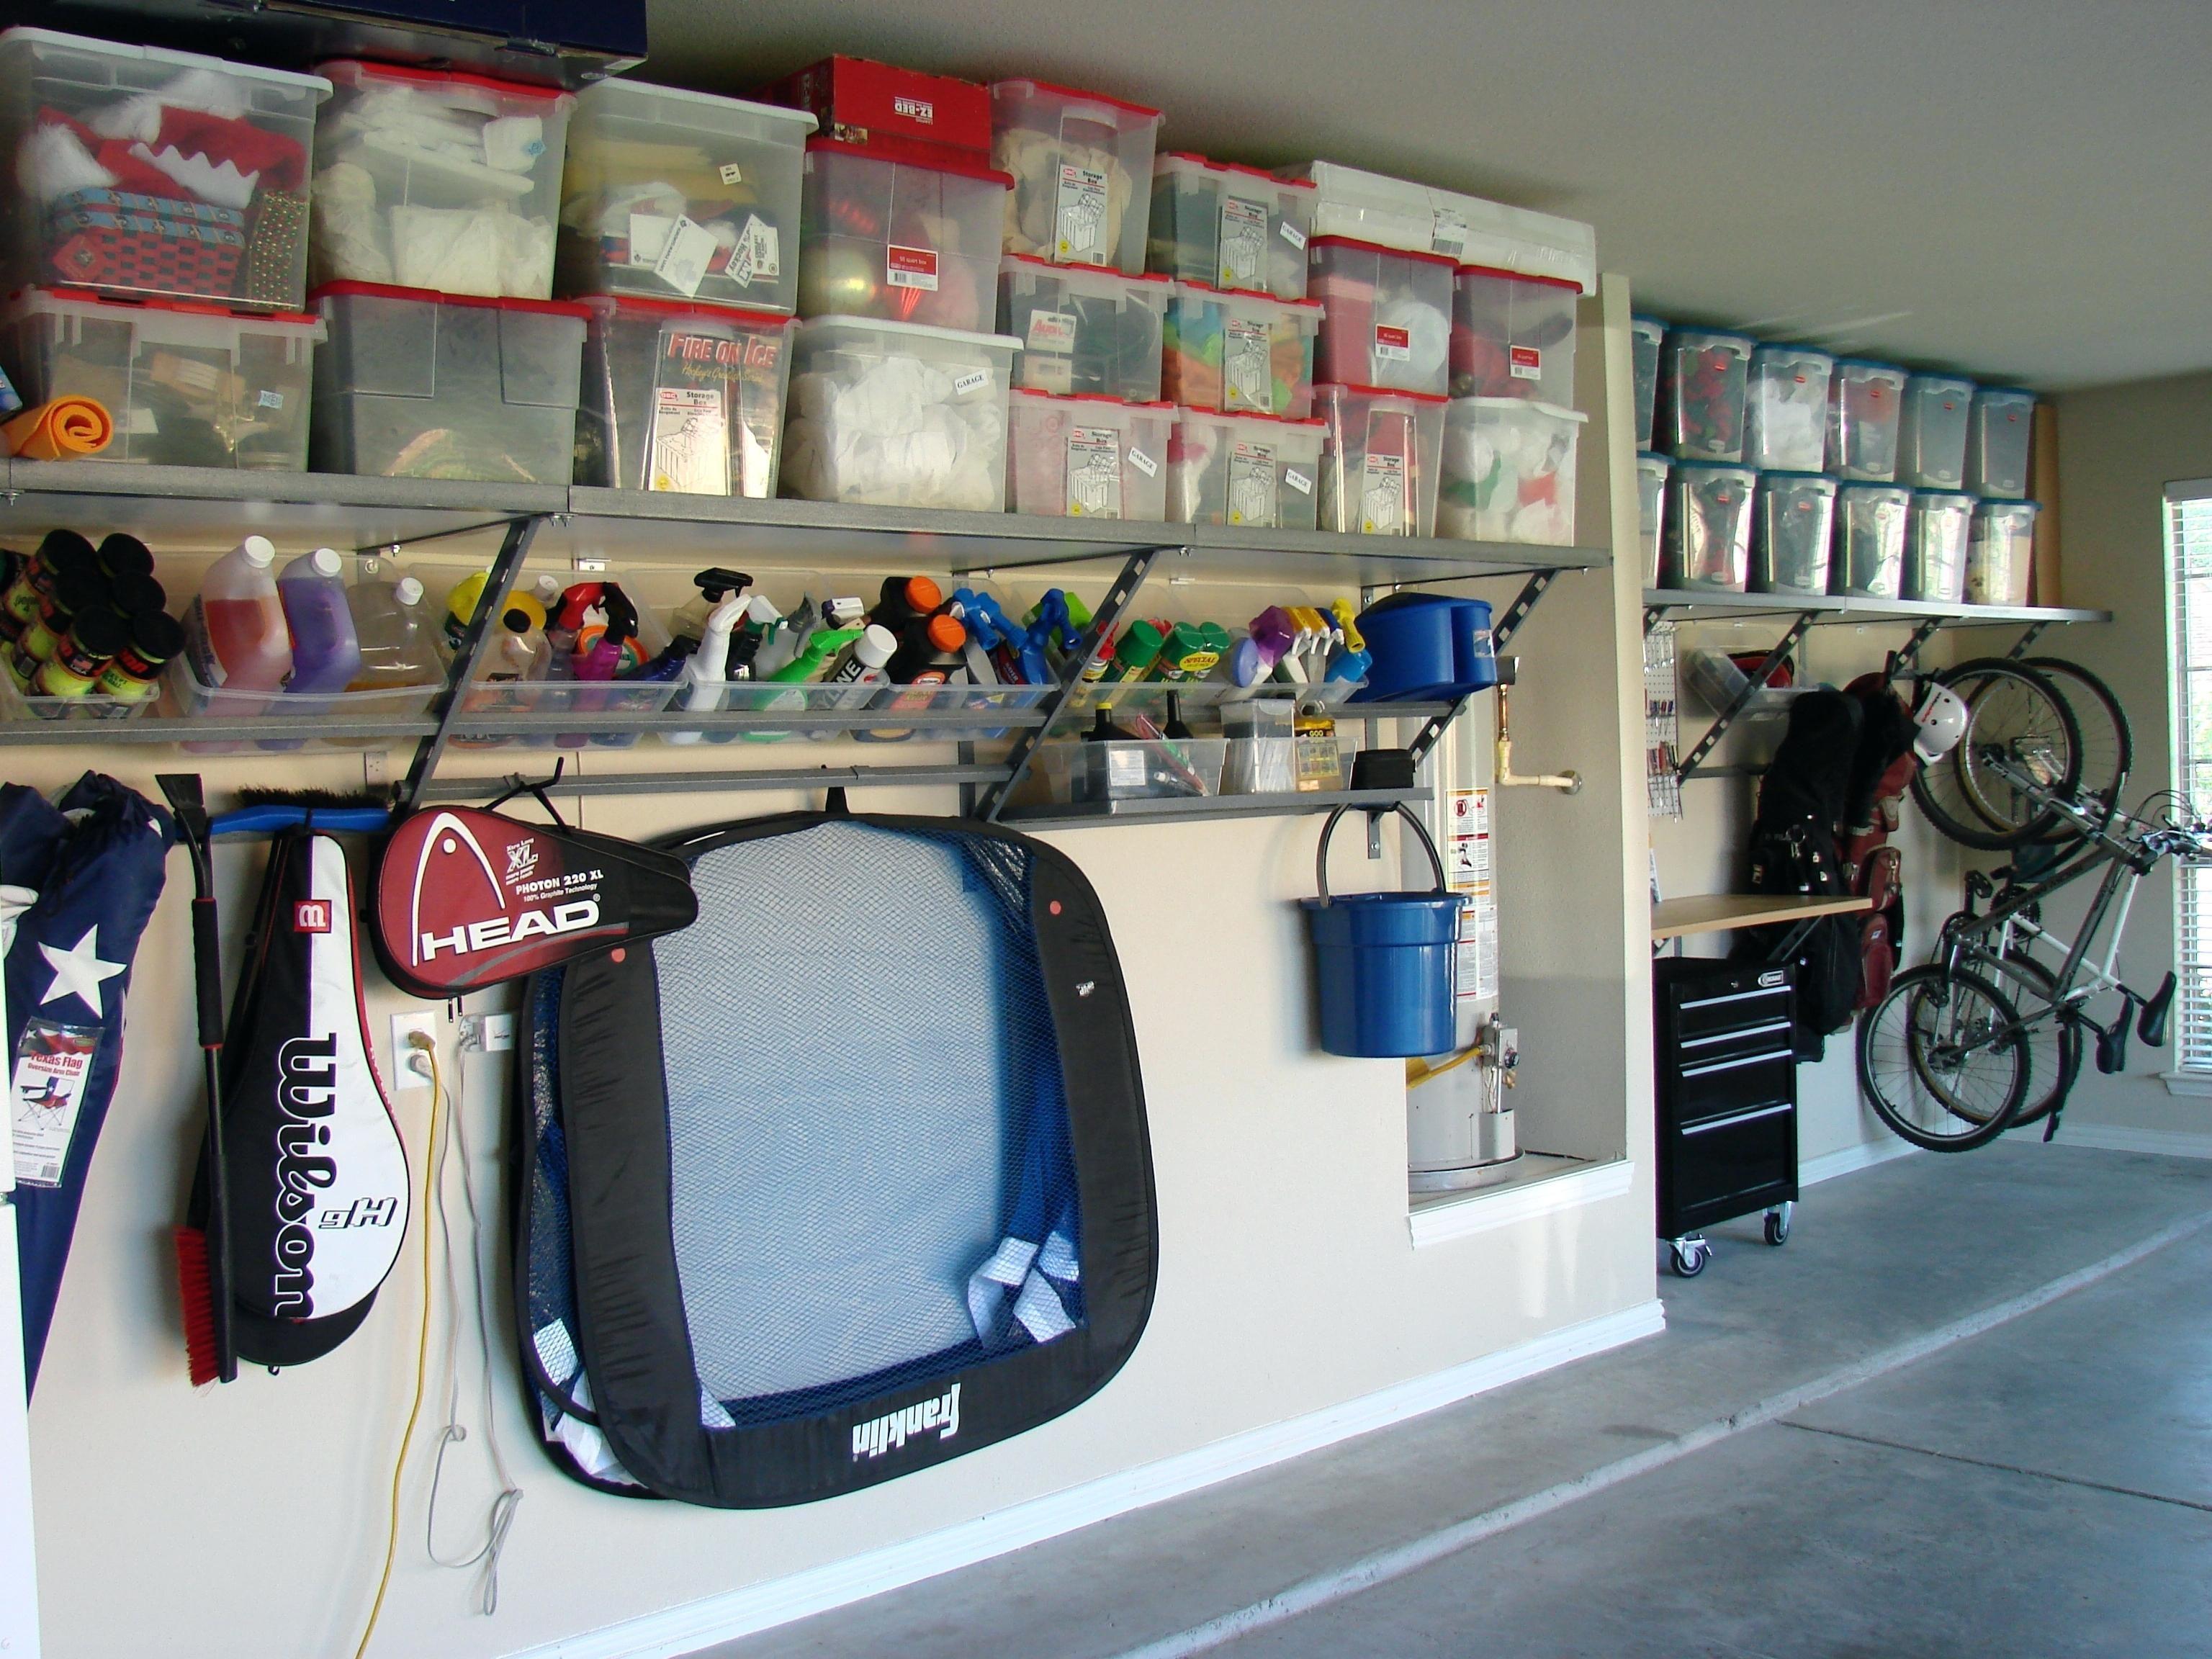 outdoor marvelous bike ceiling for racks l garage rack bicycle shelves